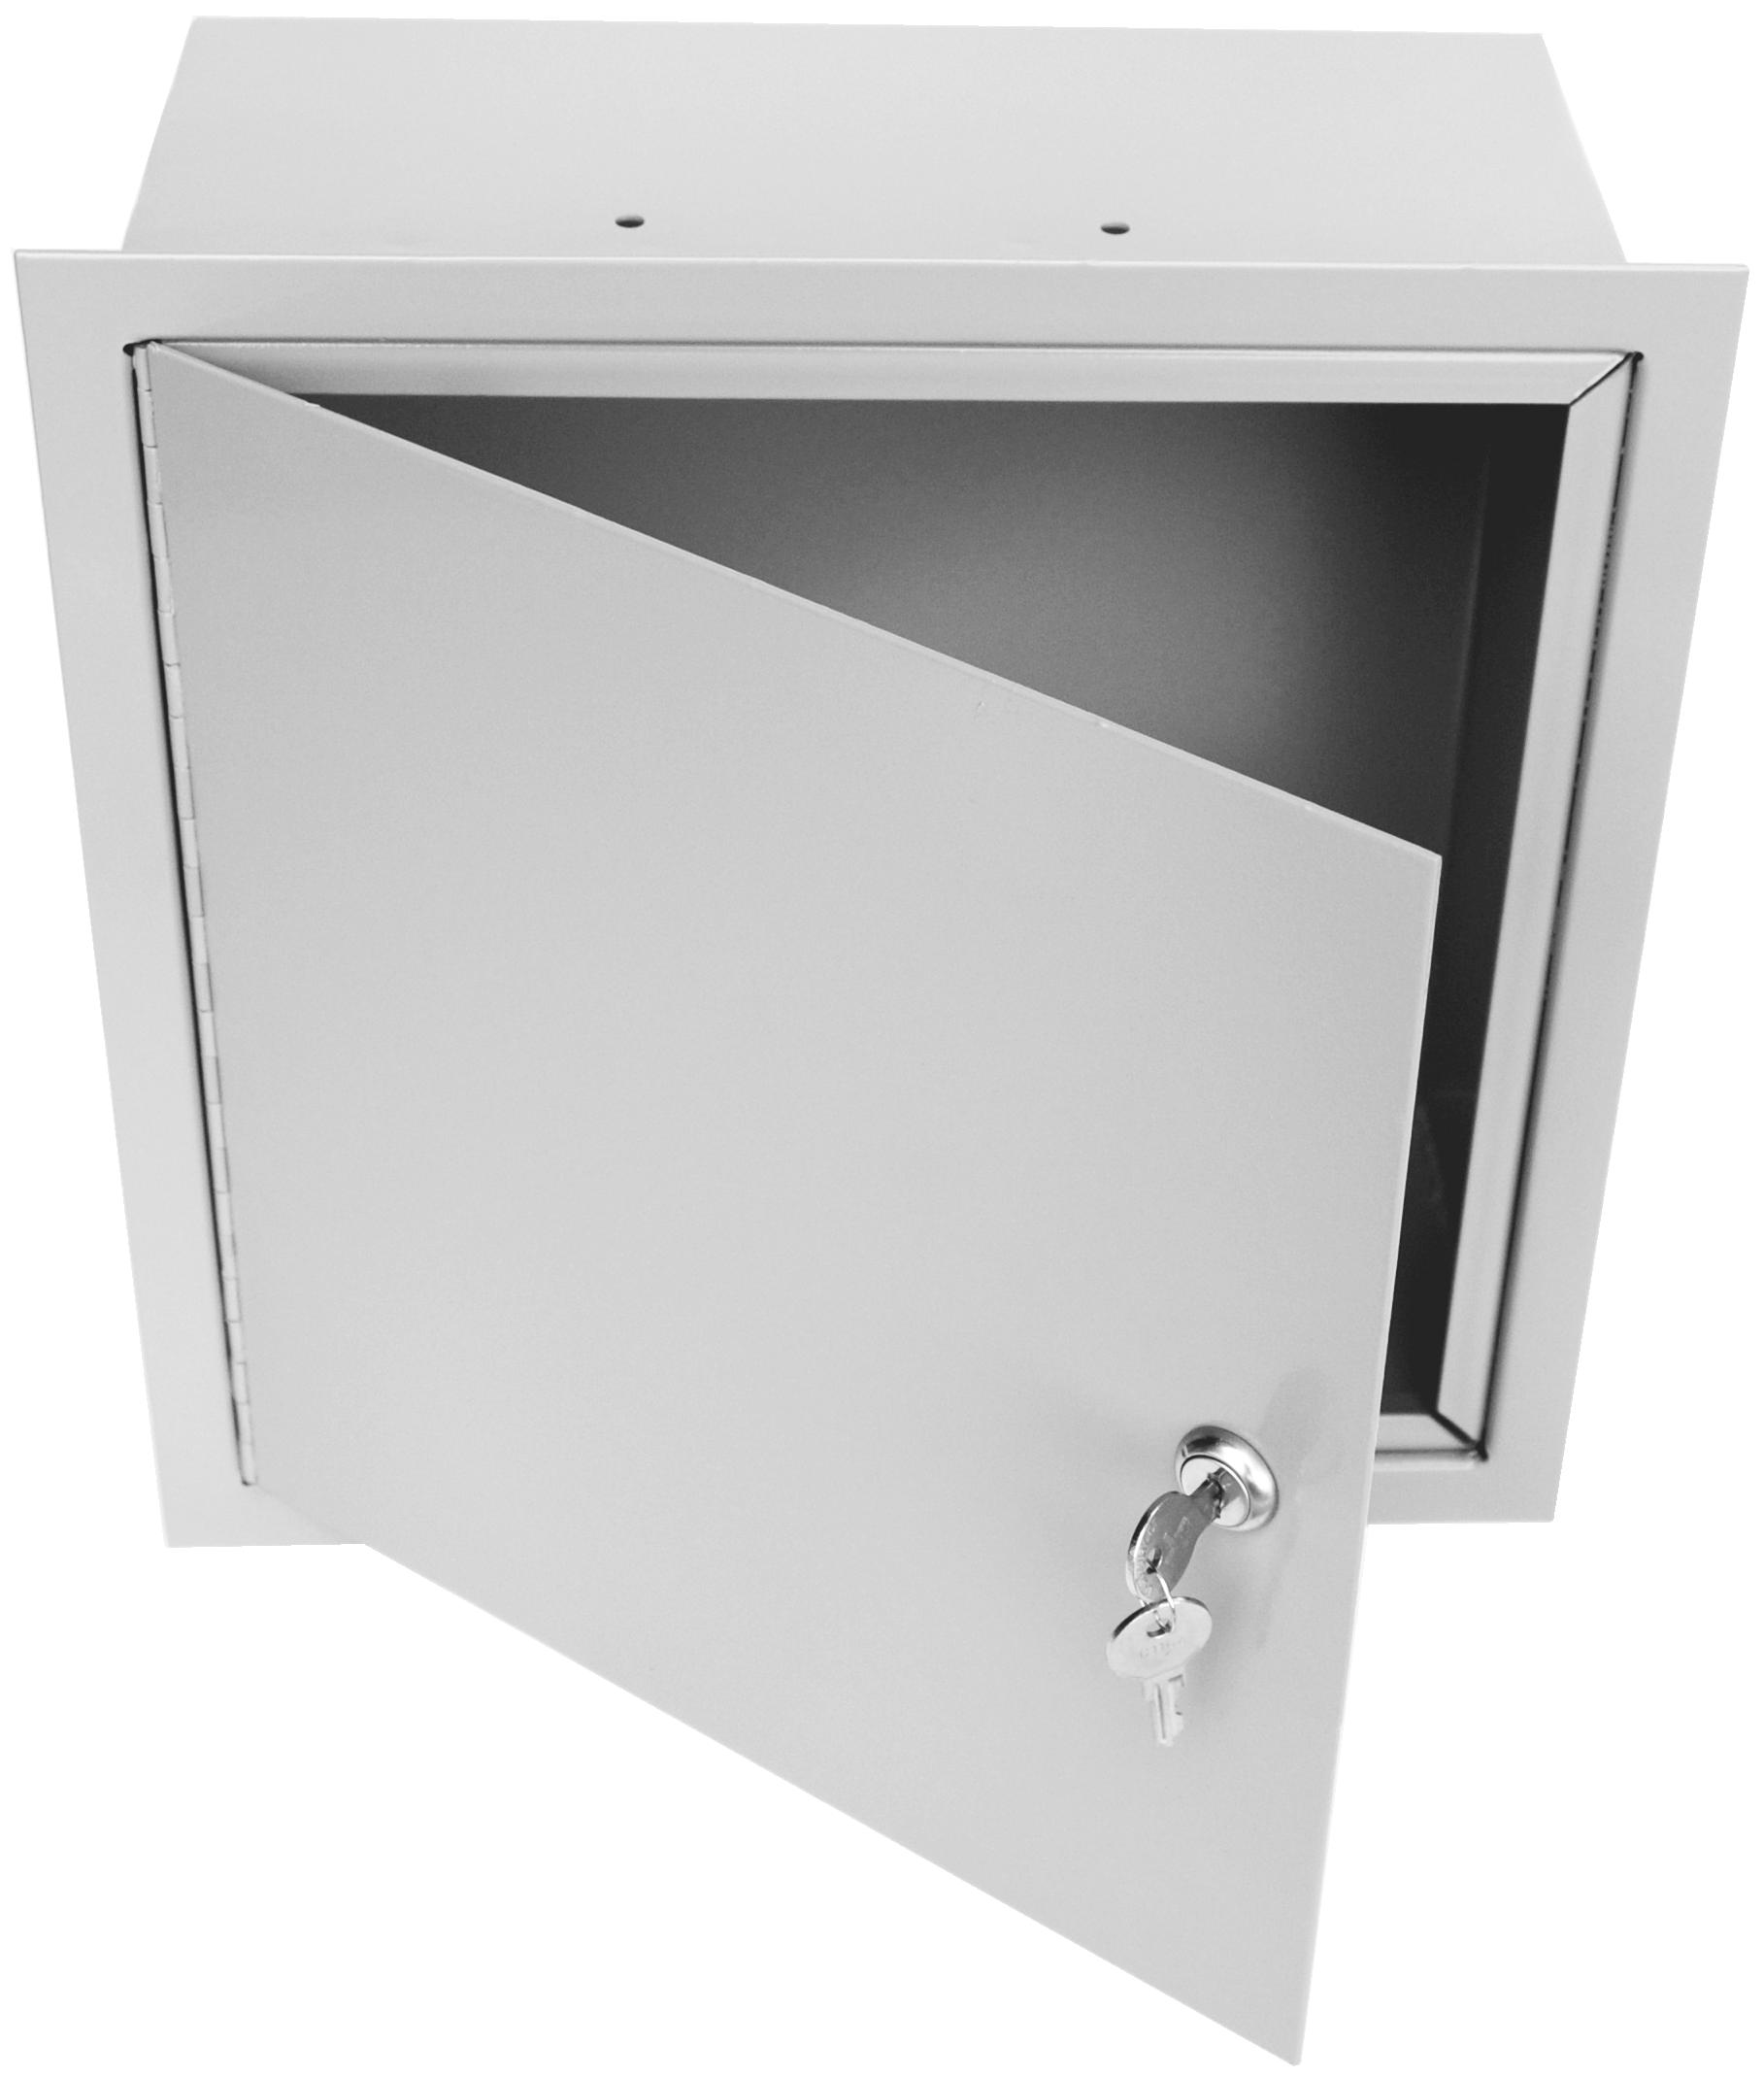 Milcor Steel Access Door 18 Quot X 18 Quot Milcor Style M